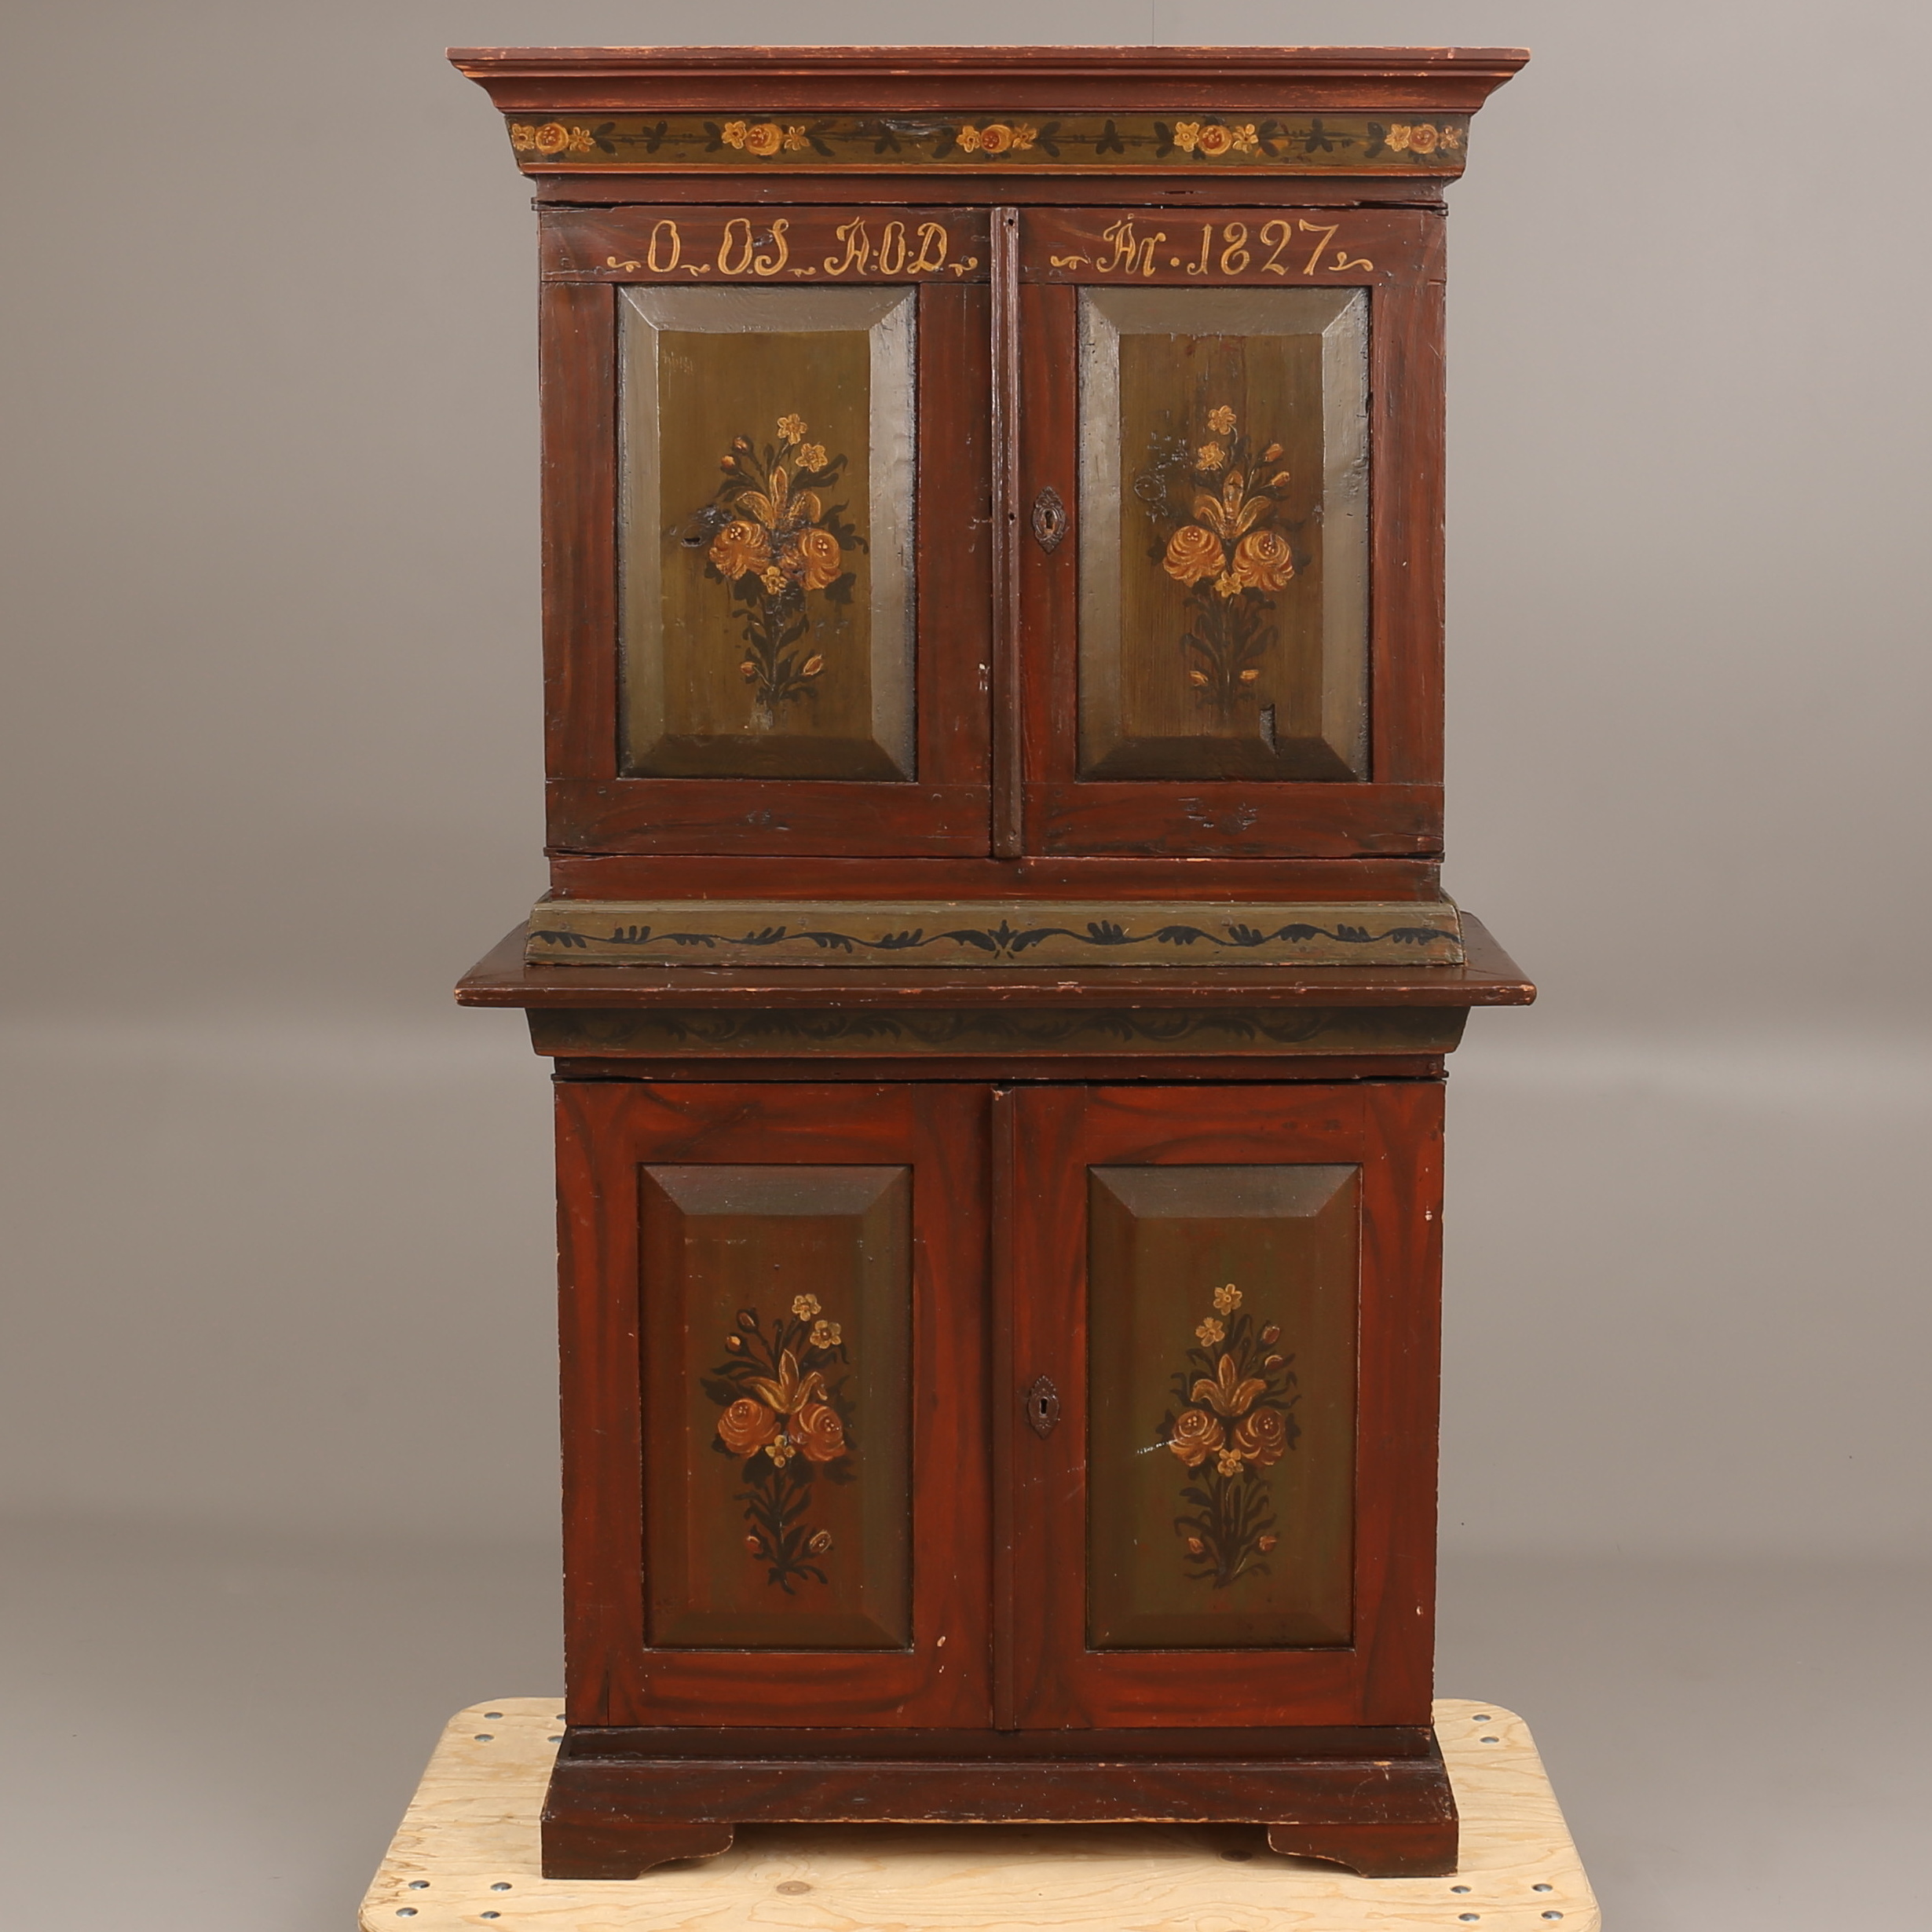 SK…P allmoge 1800 tal Furniture Cupboards & shelves Auctionet